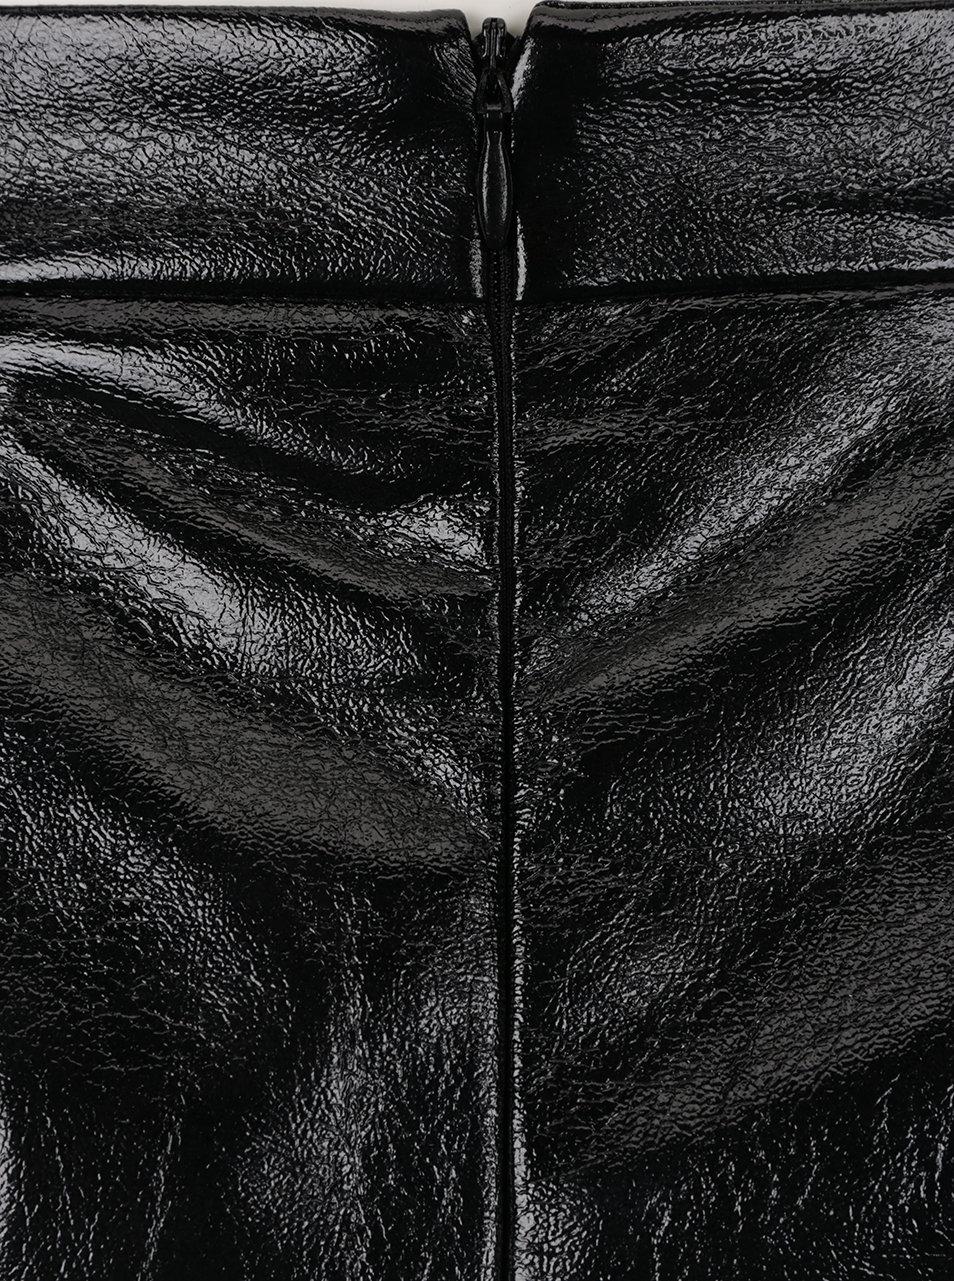 76a33a0e90a3 Černá lesklá koženková sukně s kapsami VERO MODA Rebelle ...